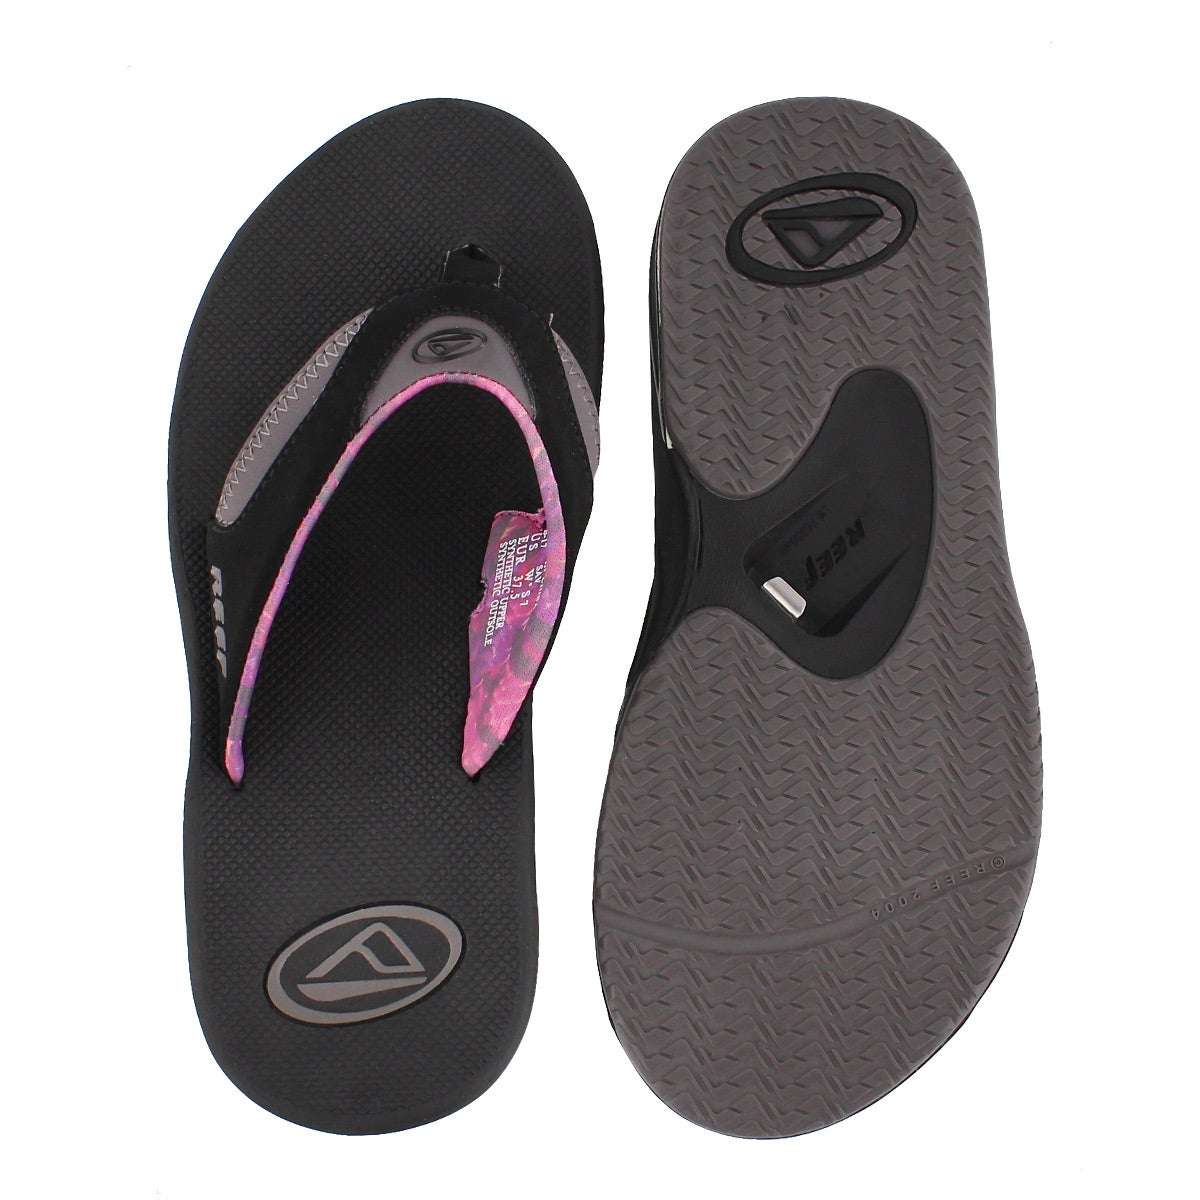 Lds Fanning black/grey thong sandal